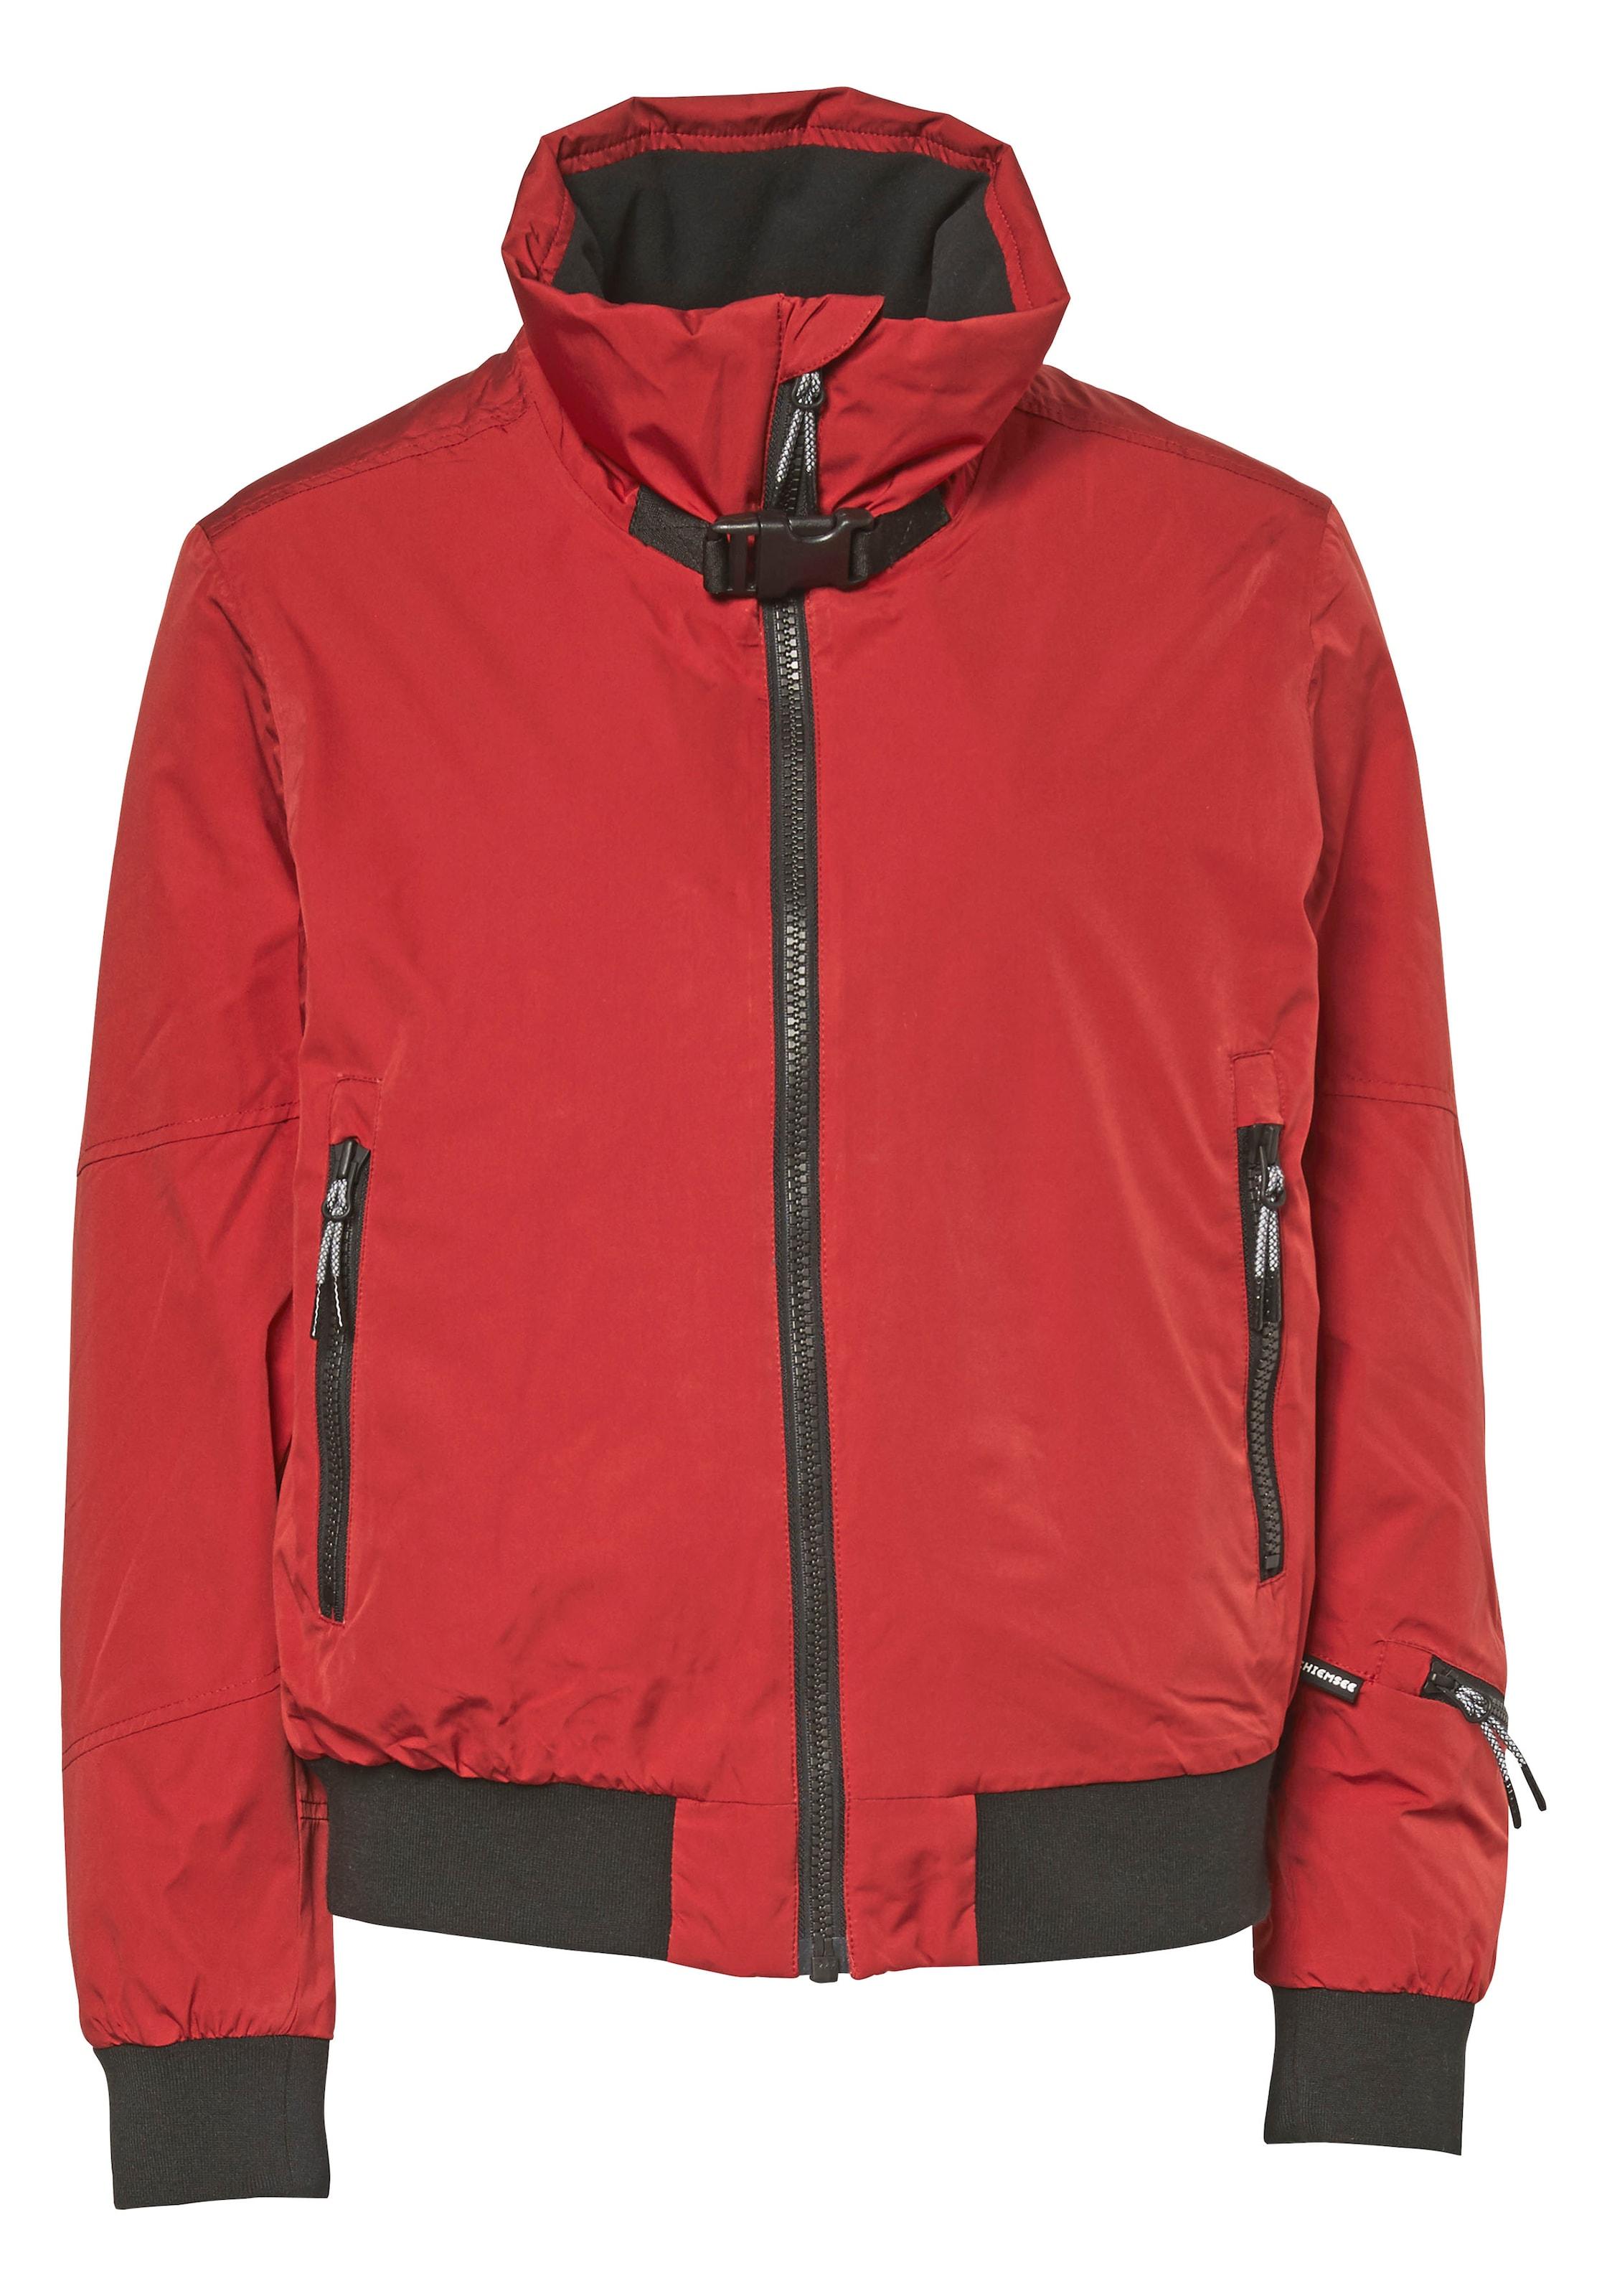 Rouge Sport De Noir Jacket' Chiemsee En Ski Veste 'heavenly nCqPOHw0B